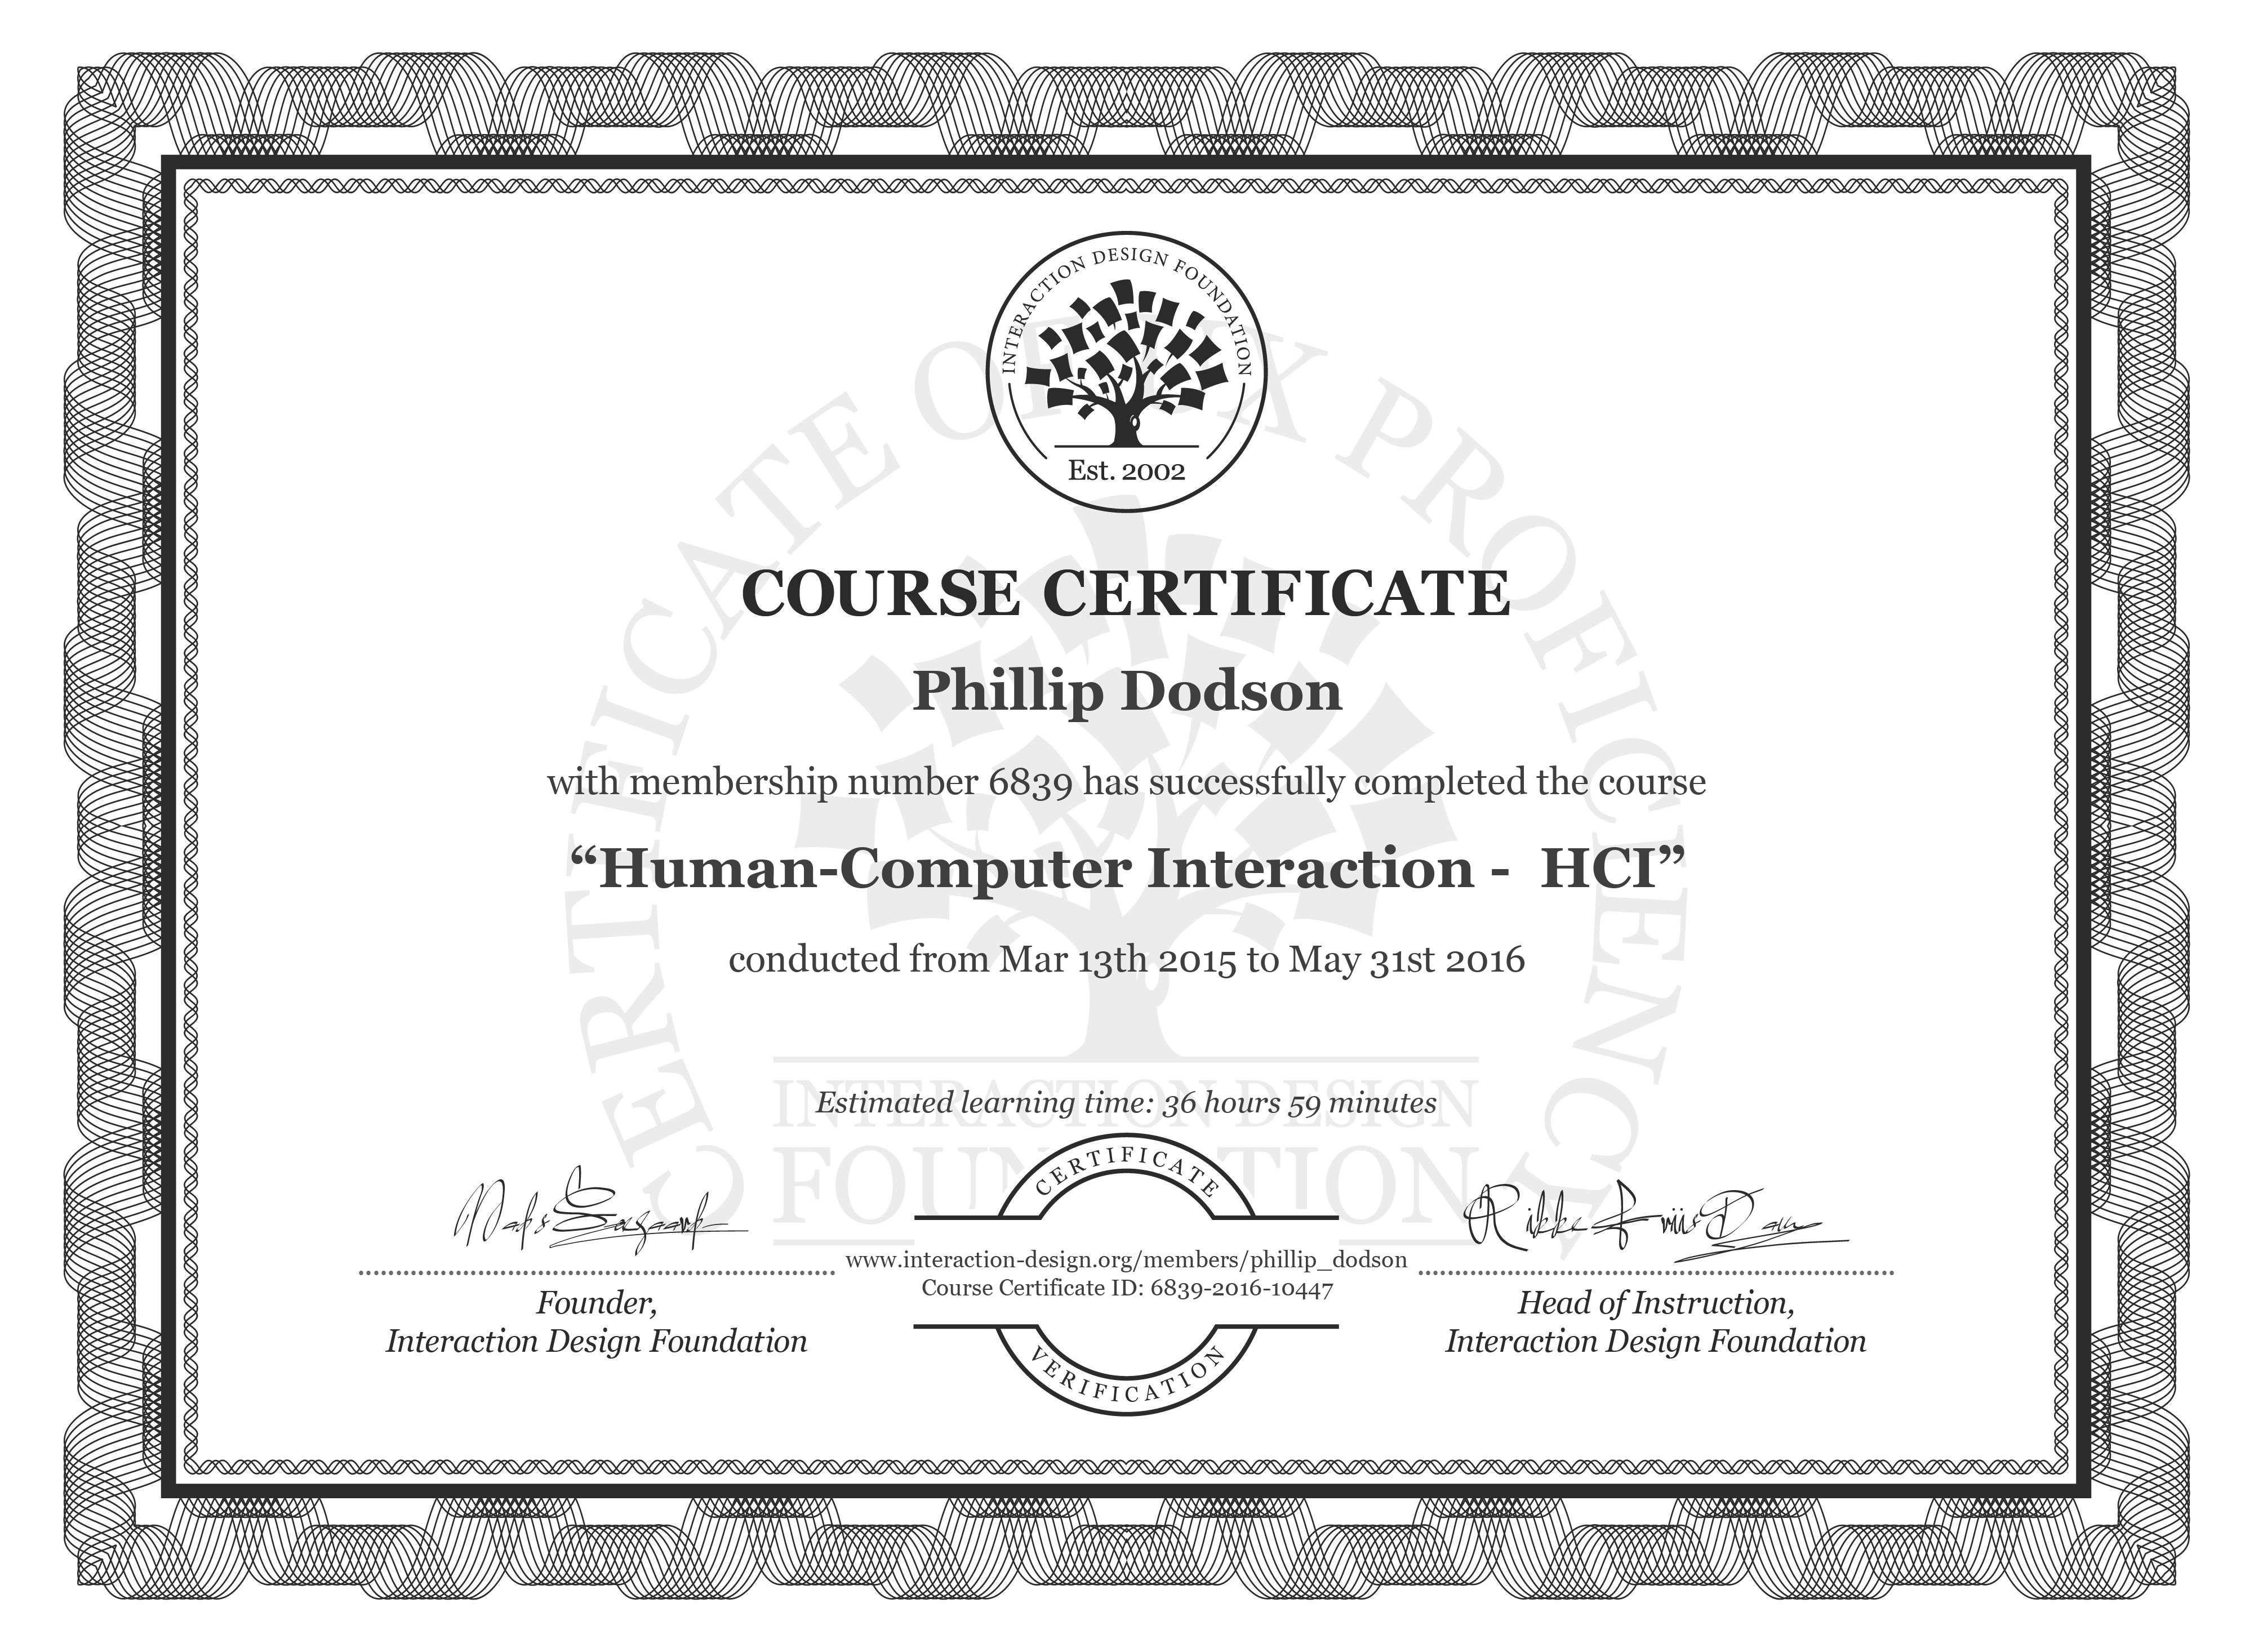 Phillip Dodson's Course Certificate: Human-Computer Interaction -  HCI